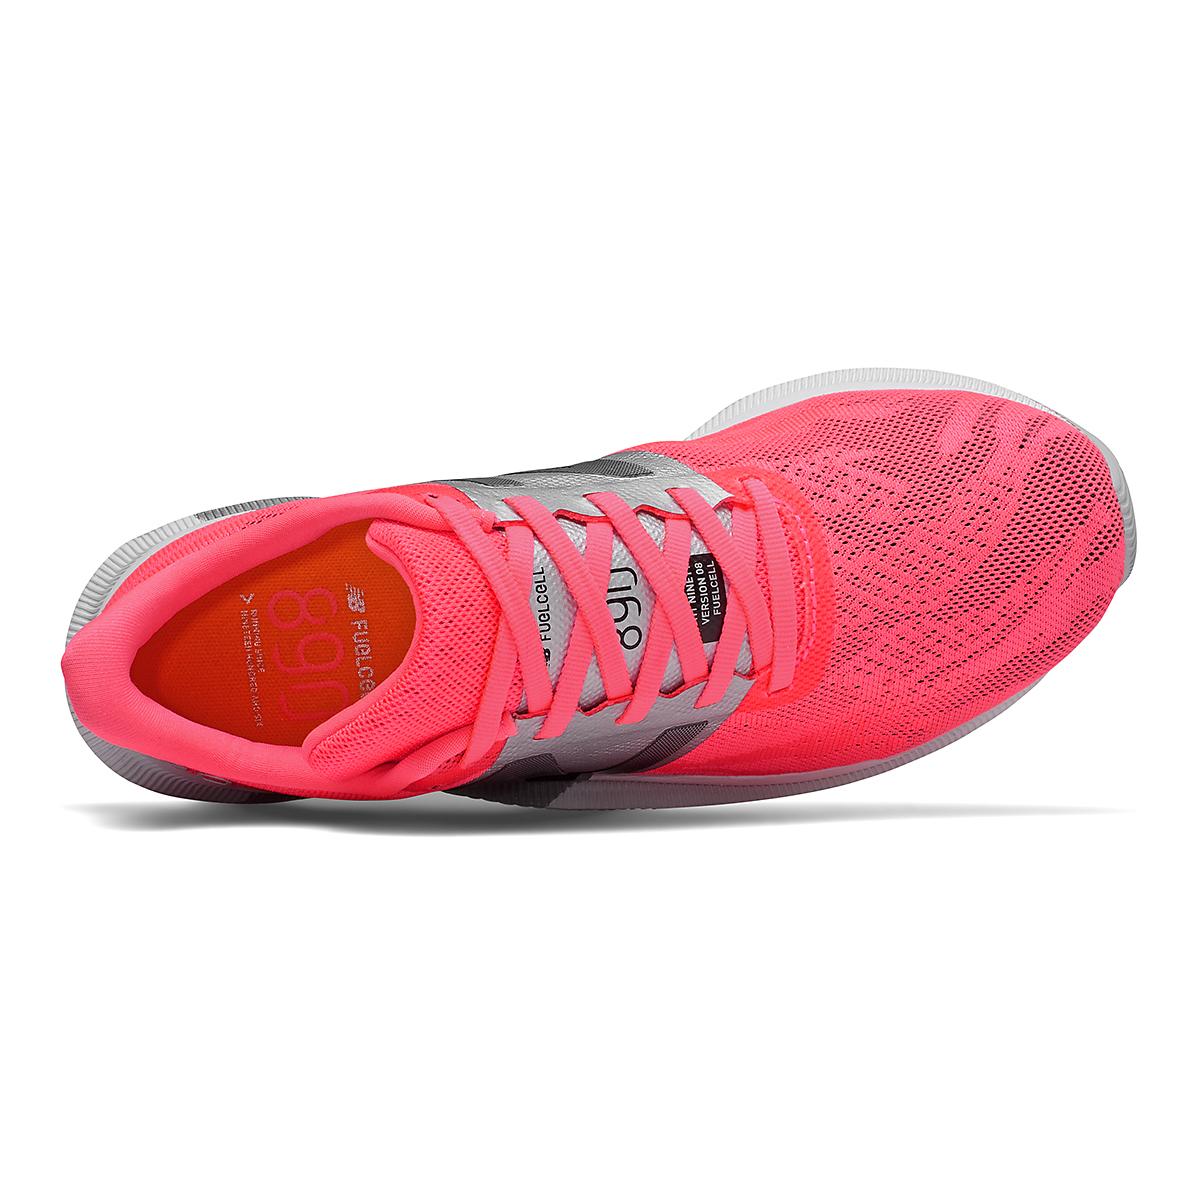 Women's New Balance 890V8 Running Shoe - Color: Guava - Size: 7 - Width: Regular, Guava, large, image 3